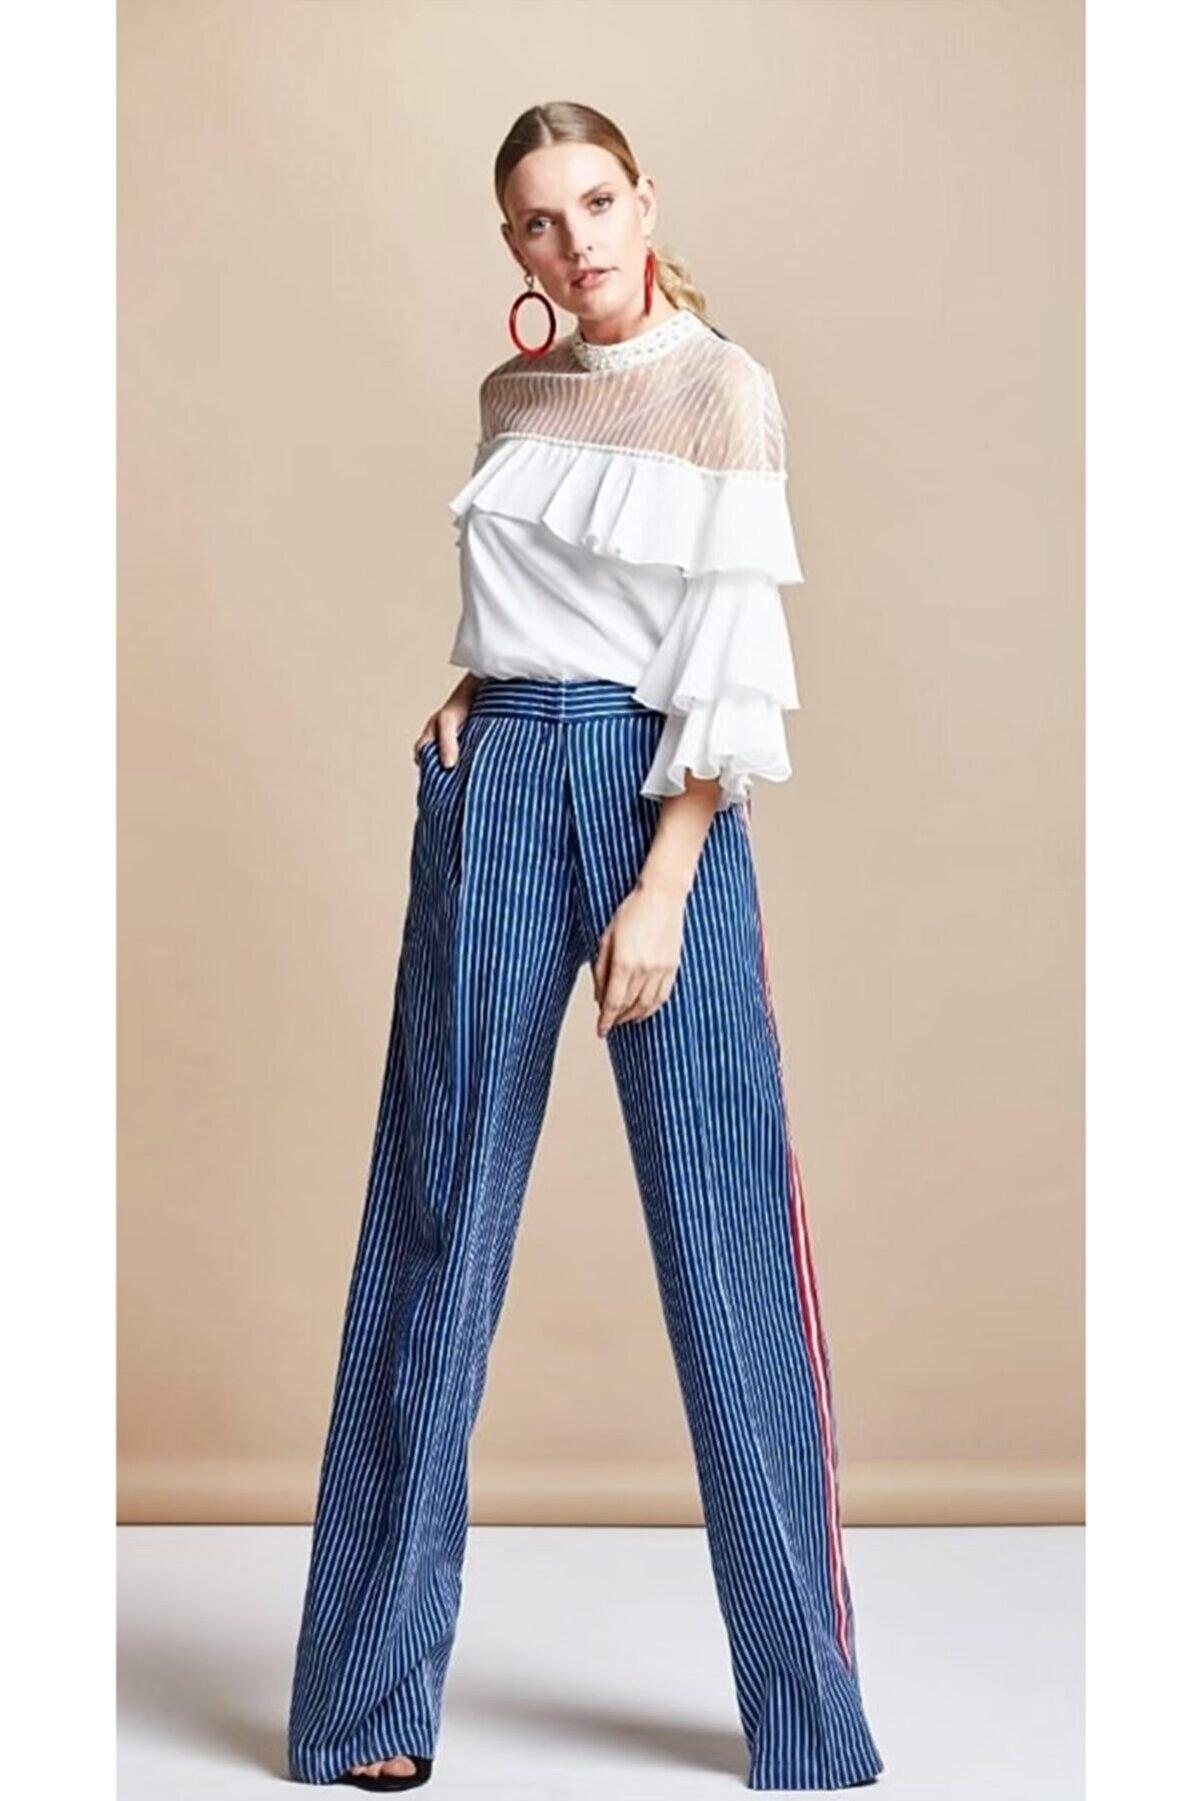 Serpil Kadın Lacivert Çizgili Pantalon